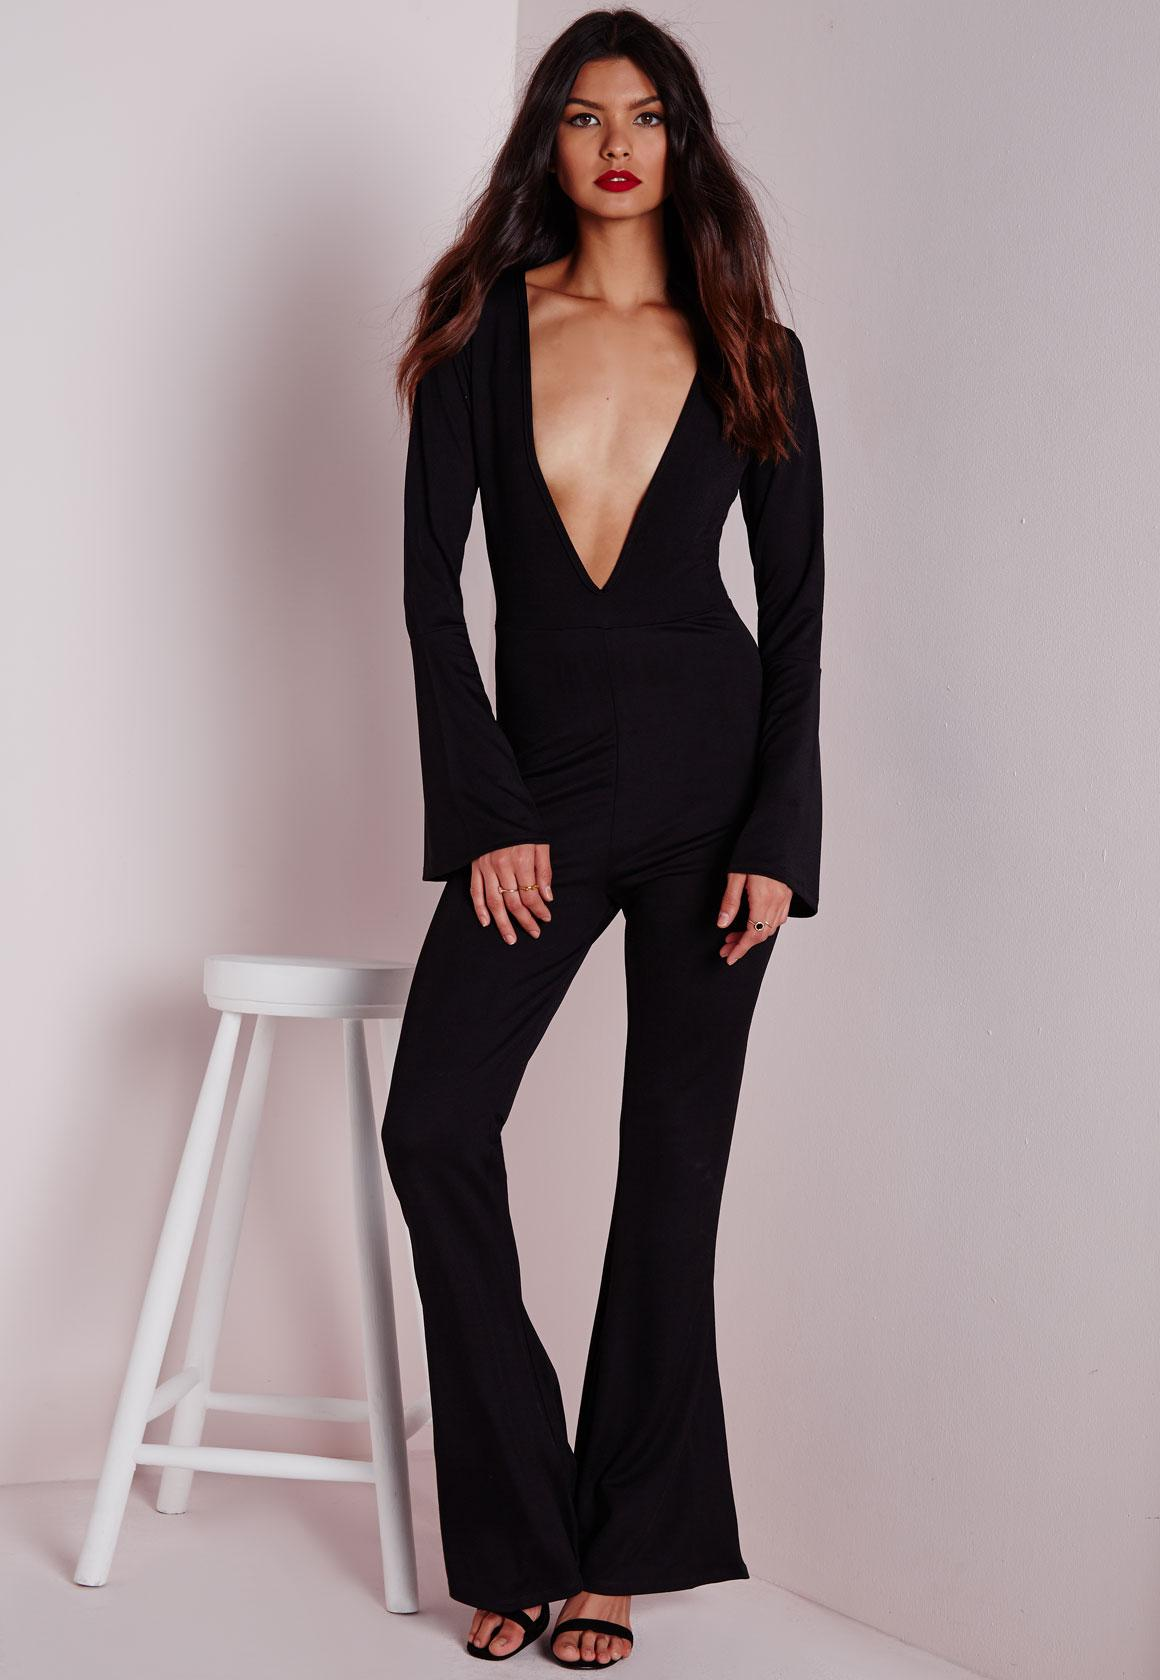 Plunge Flared Sleeve Jumpsuit Black - Plunge - Jumpsuits - Missguided